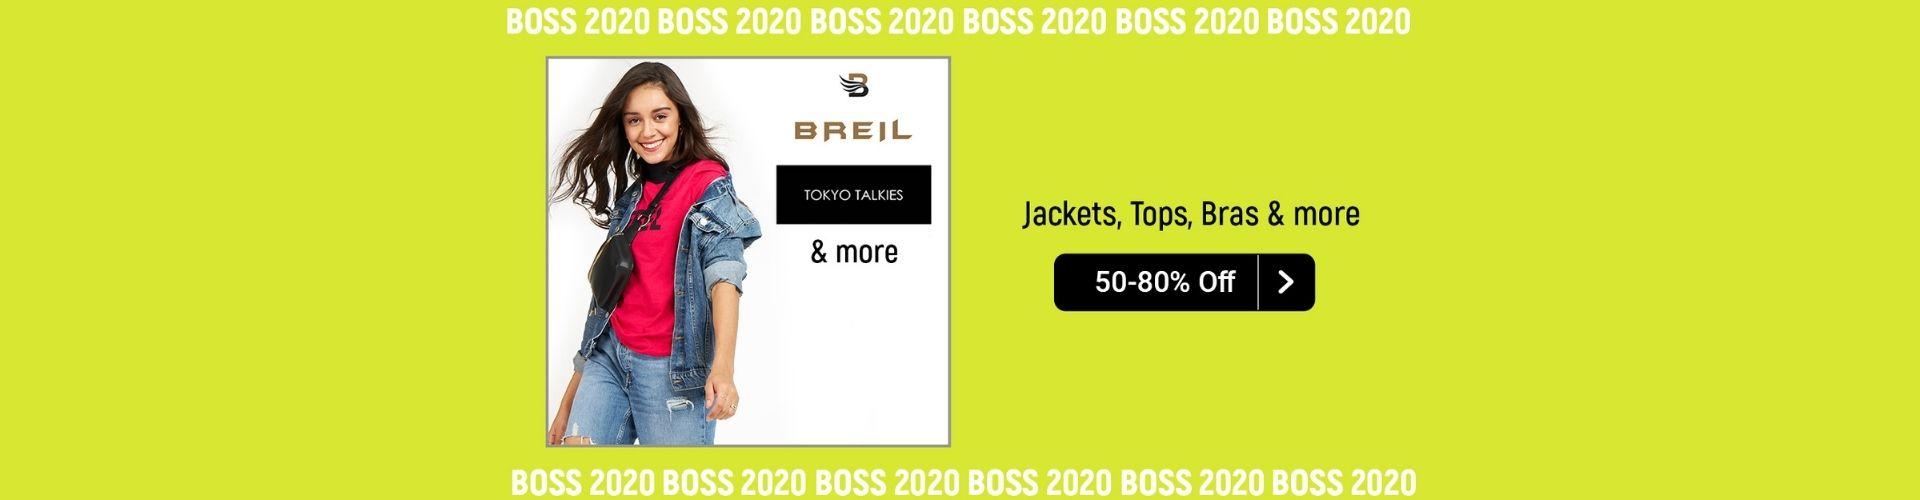 Get tops dresses at minimum 50% discount on casual dresses for women at flipkart BOSS sale